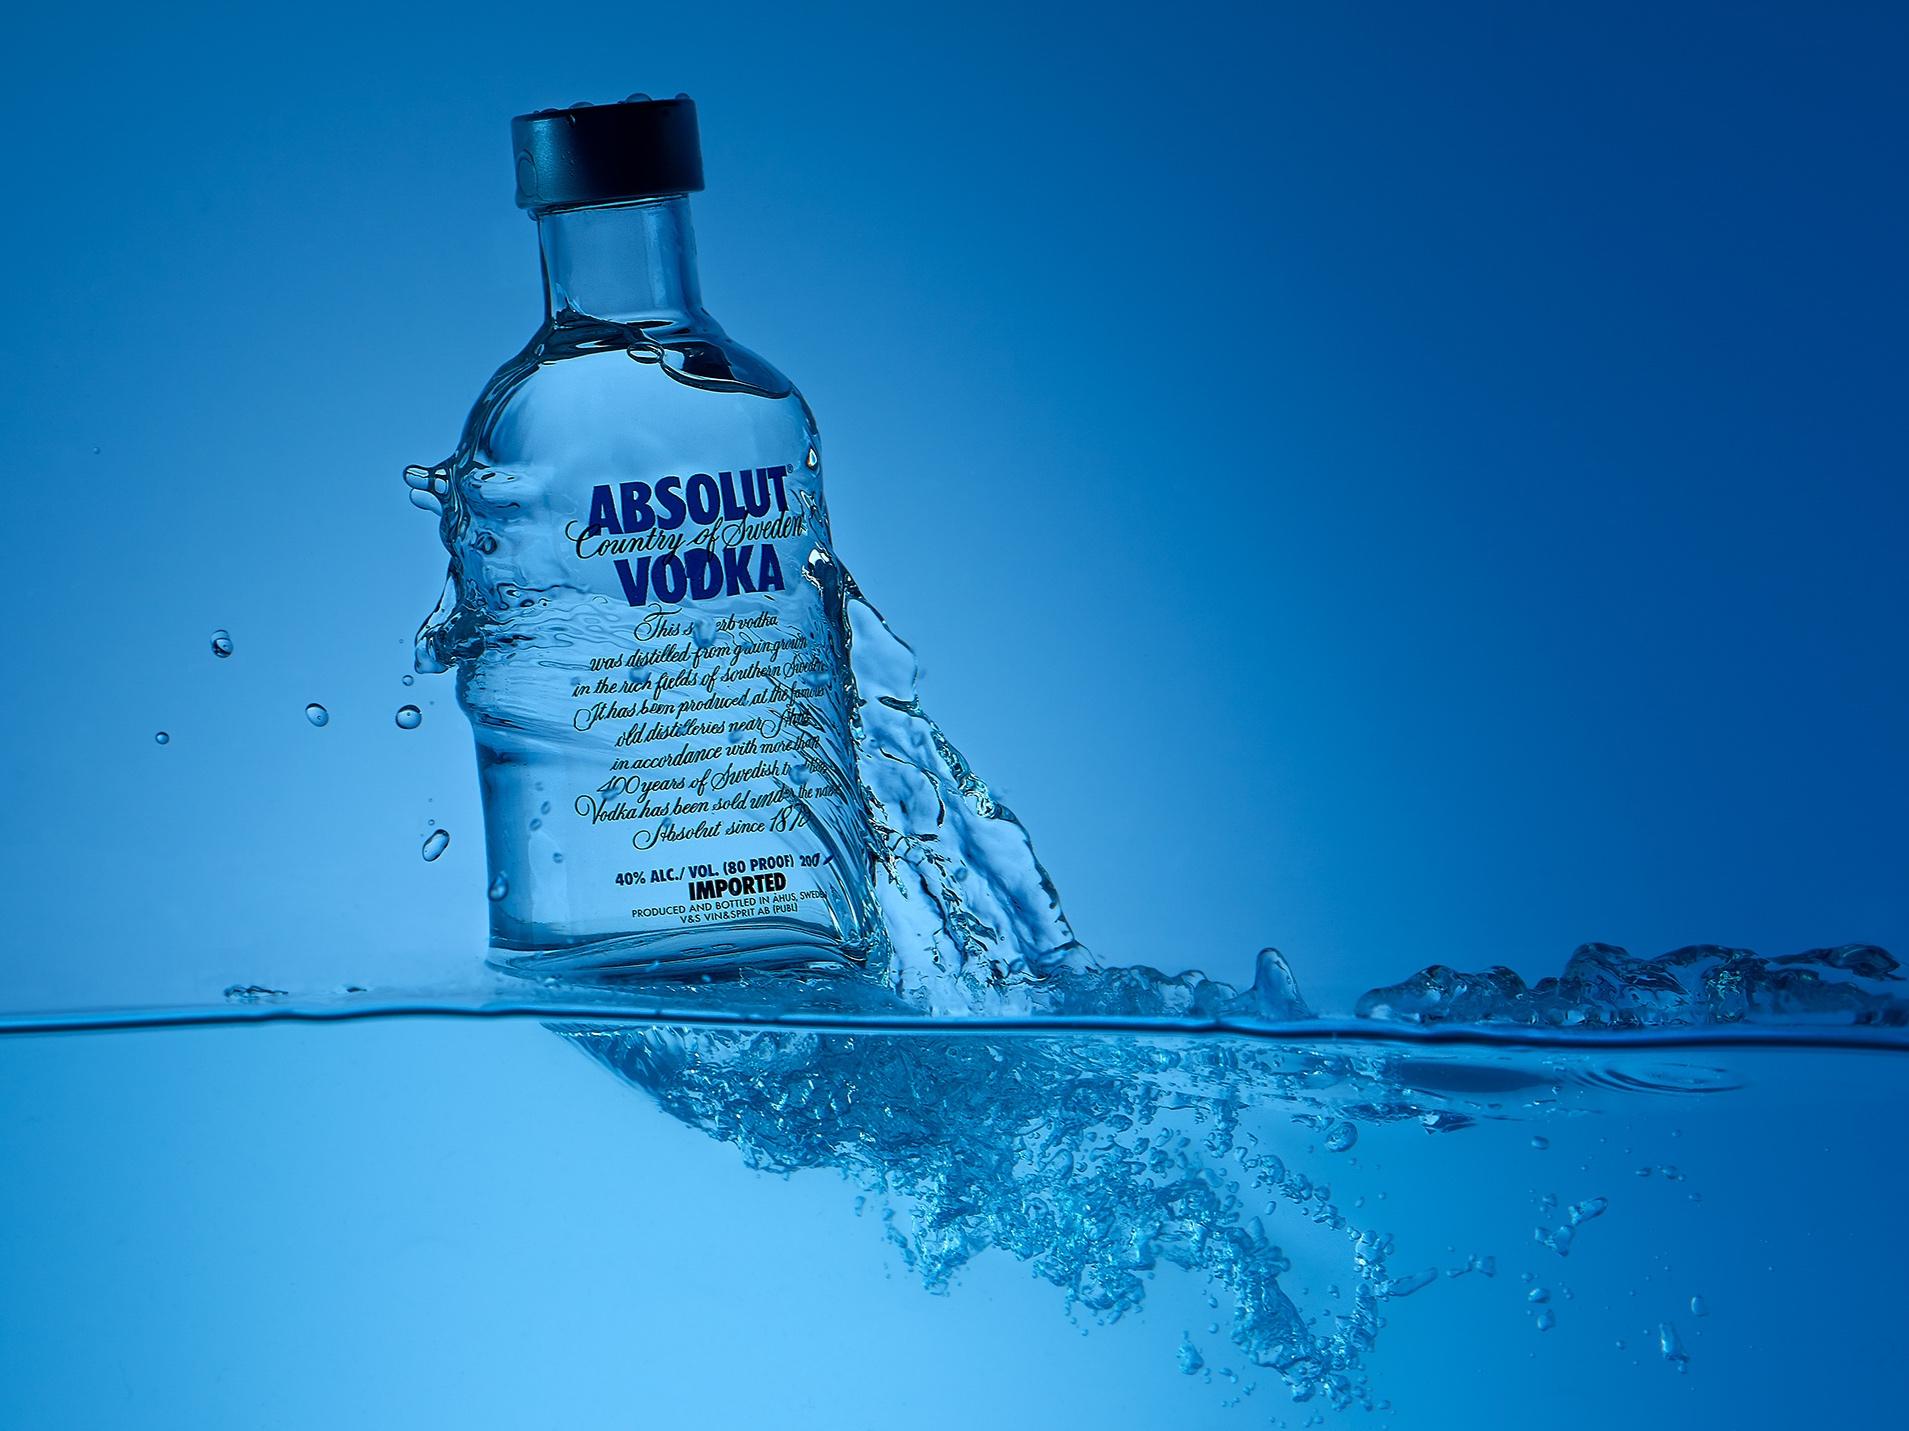 vodka-absolut-philippe-hahn.jpg